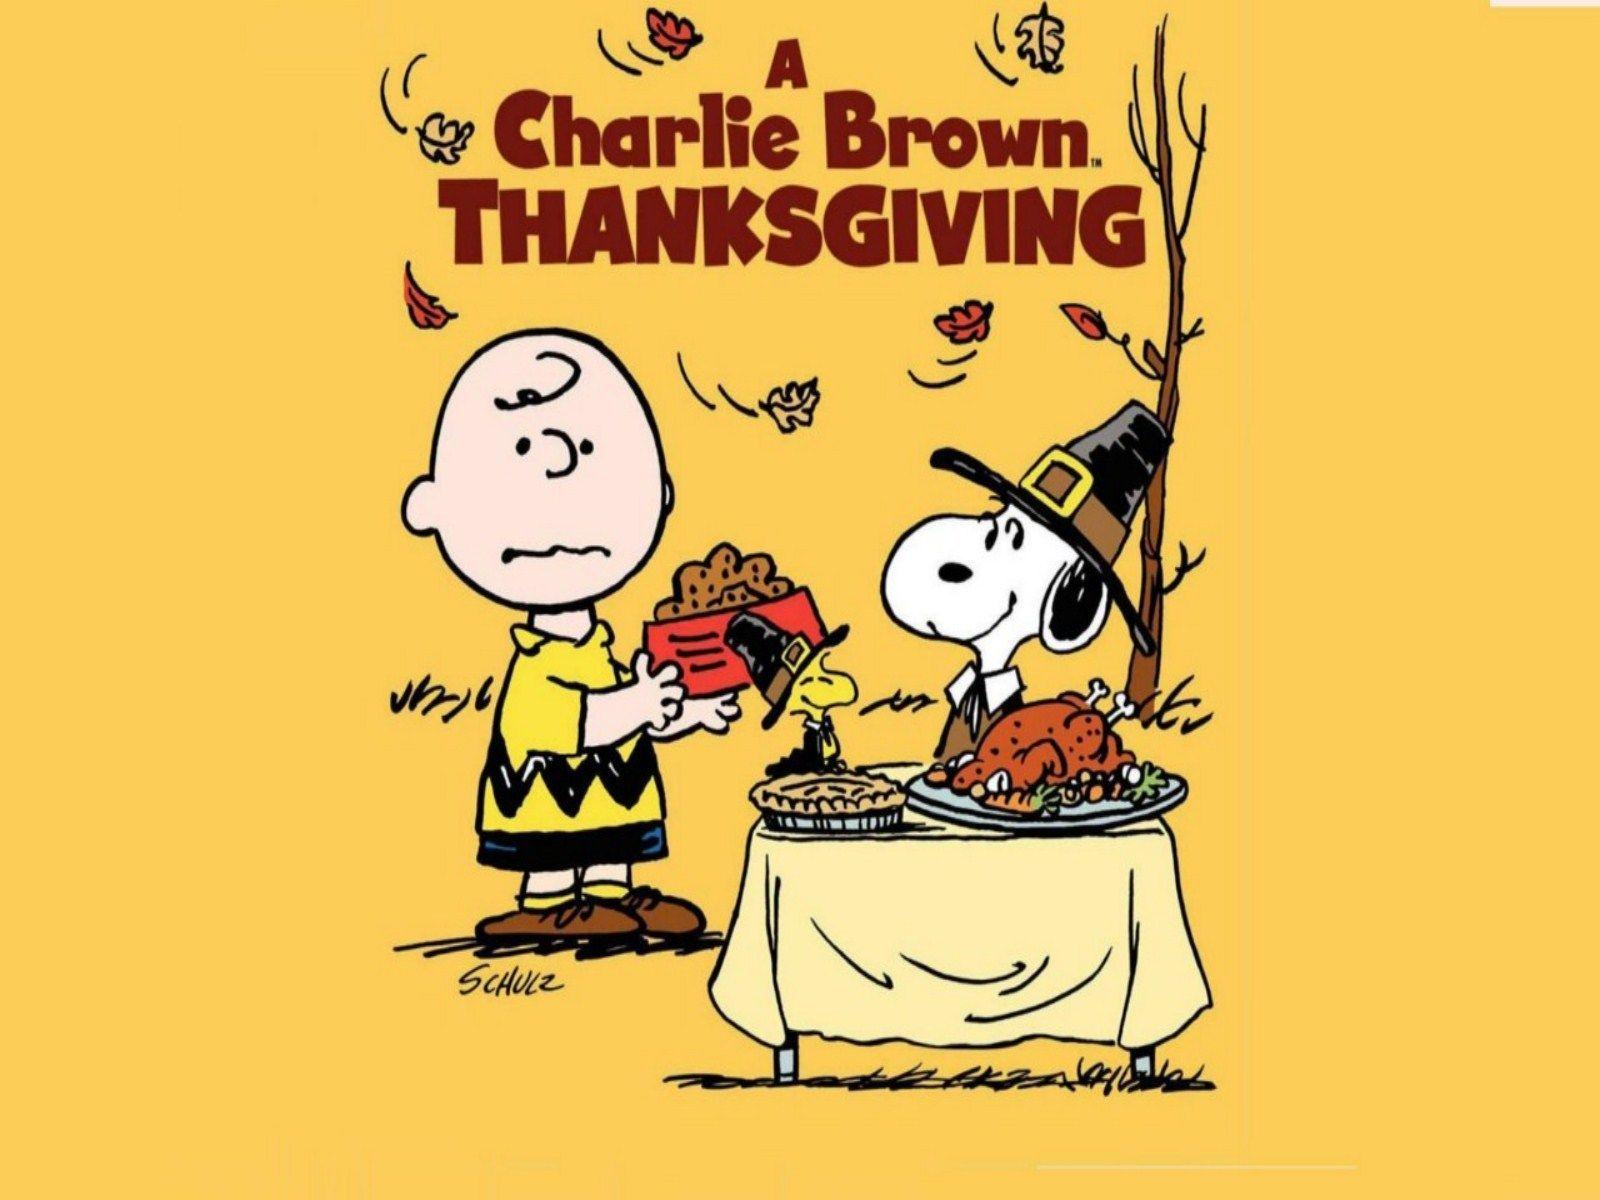 Charlie brown thanksgiving wallpaper